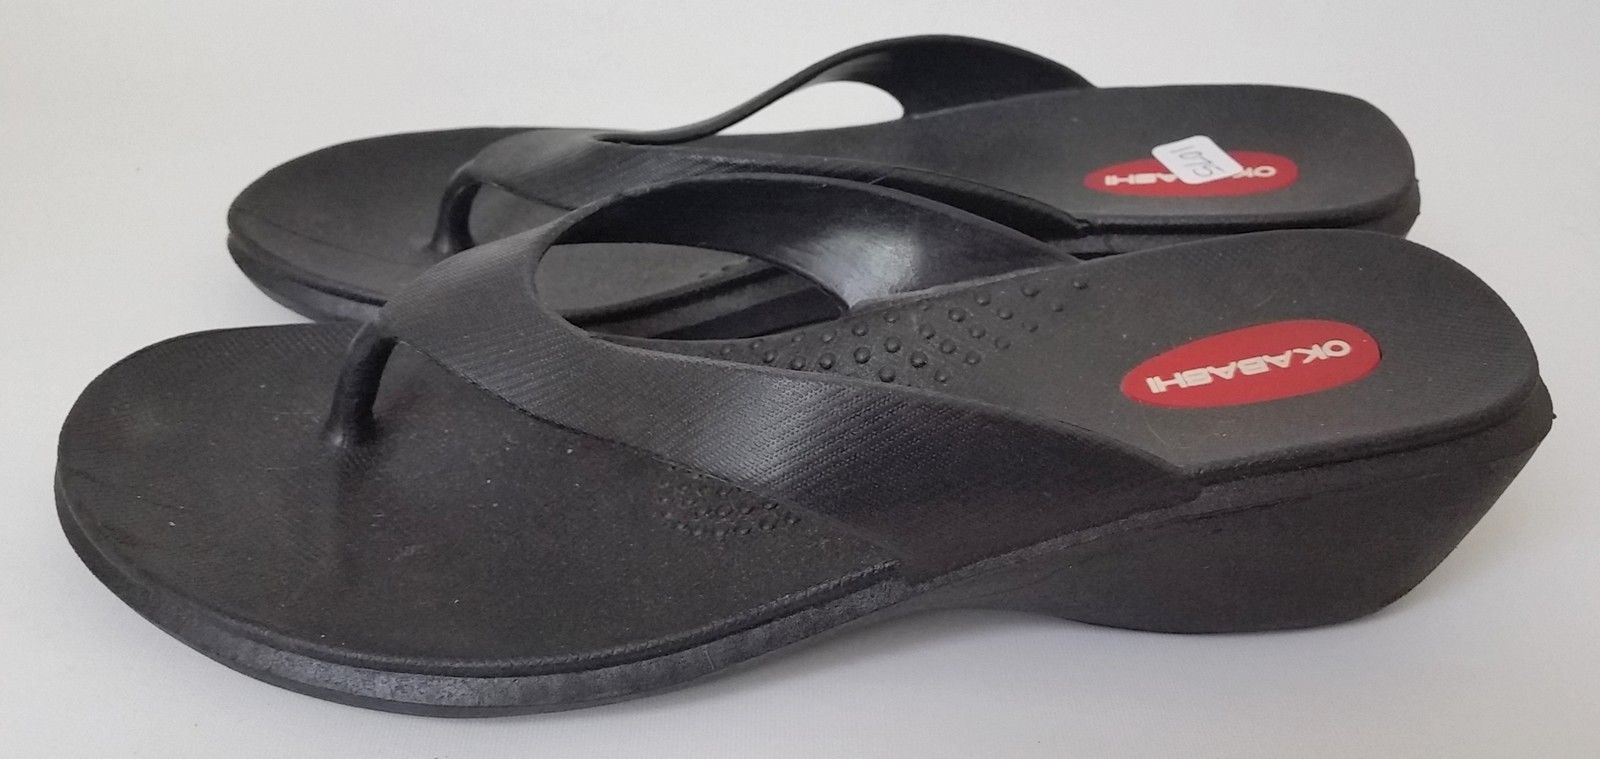 Okabashi Shoes Sandals Thong Wedge Black USA Womens Size M